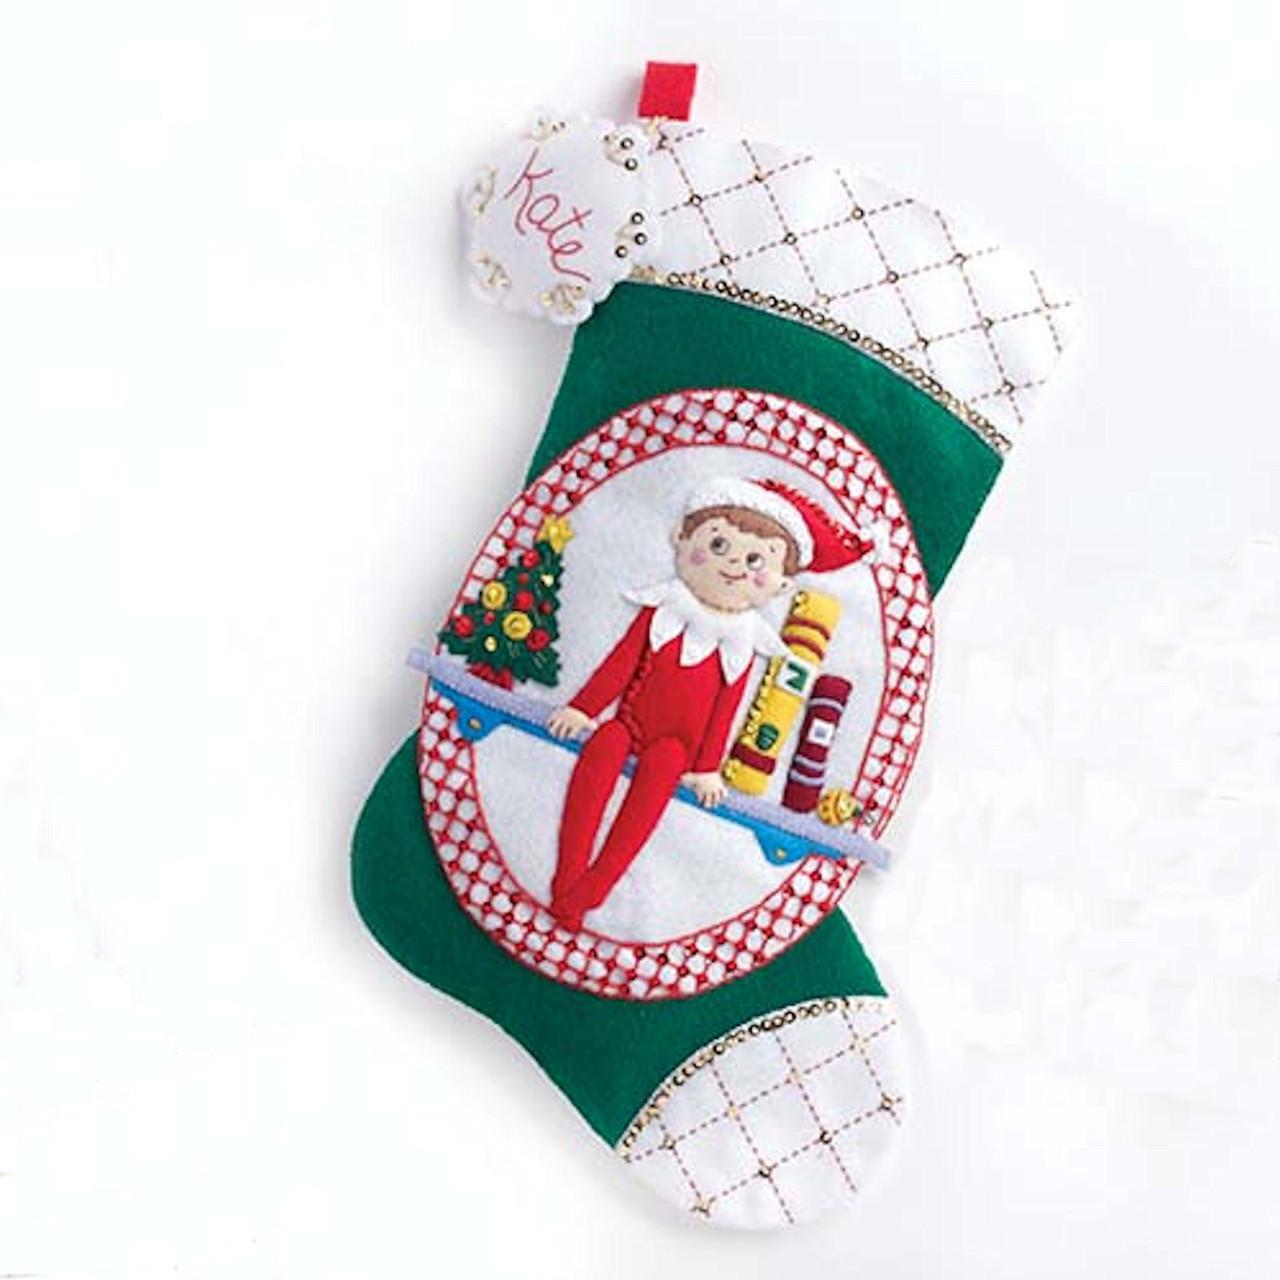 Plaid / Elf on the Shelf - Christmas Stocking